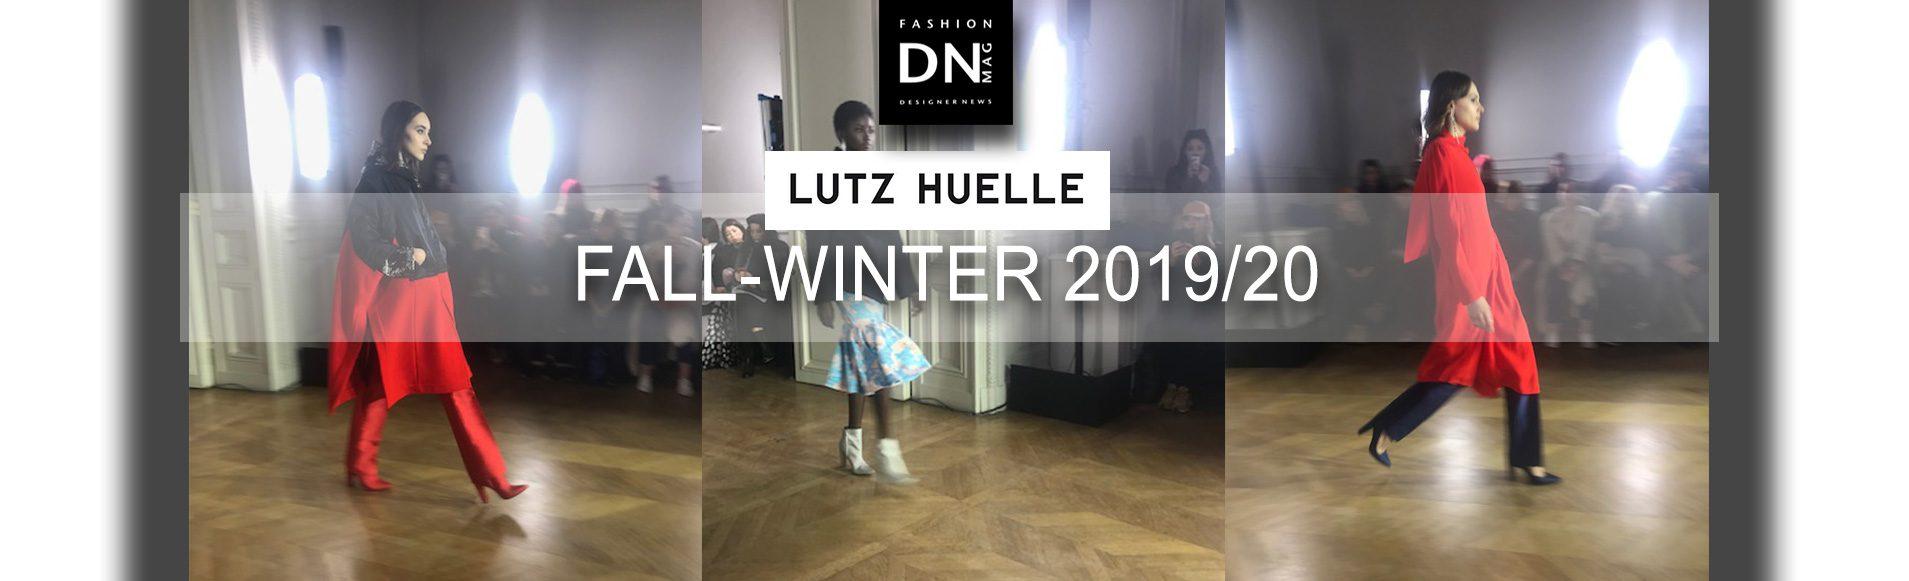 DNMAG-LUTZ-HUELLE-RTW19-FW2019